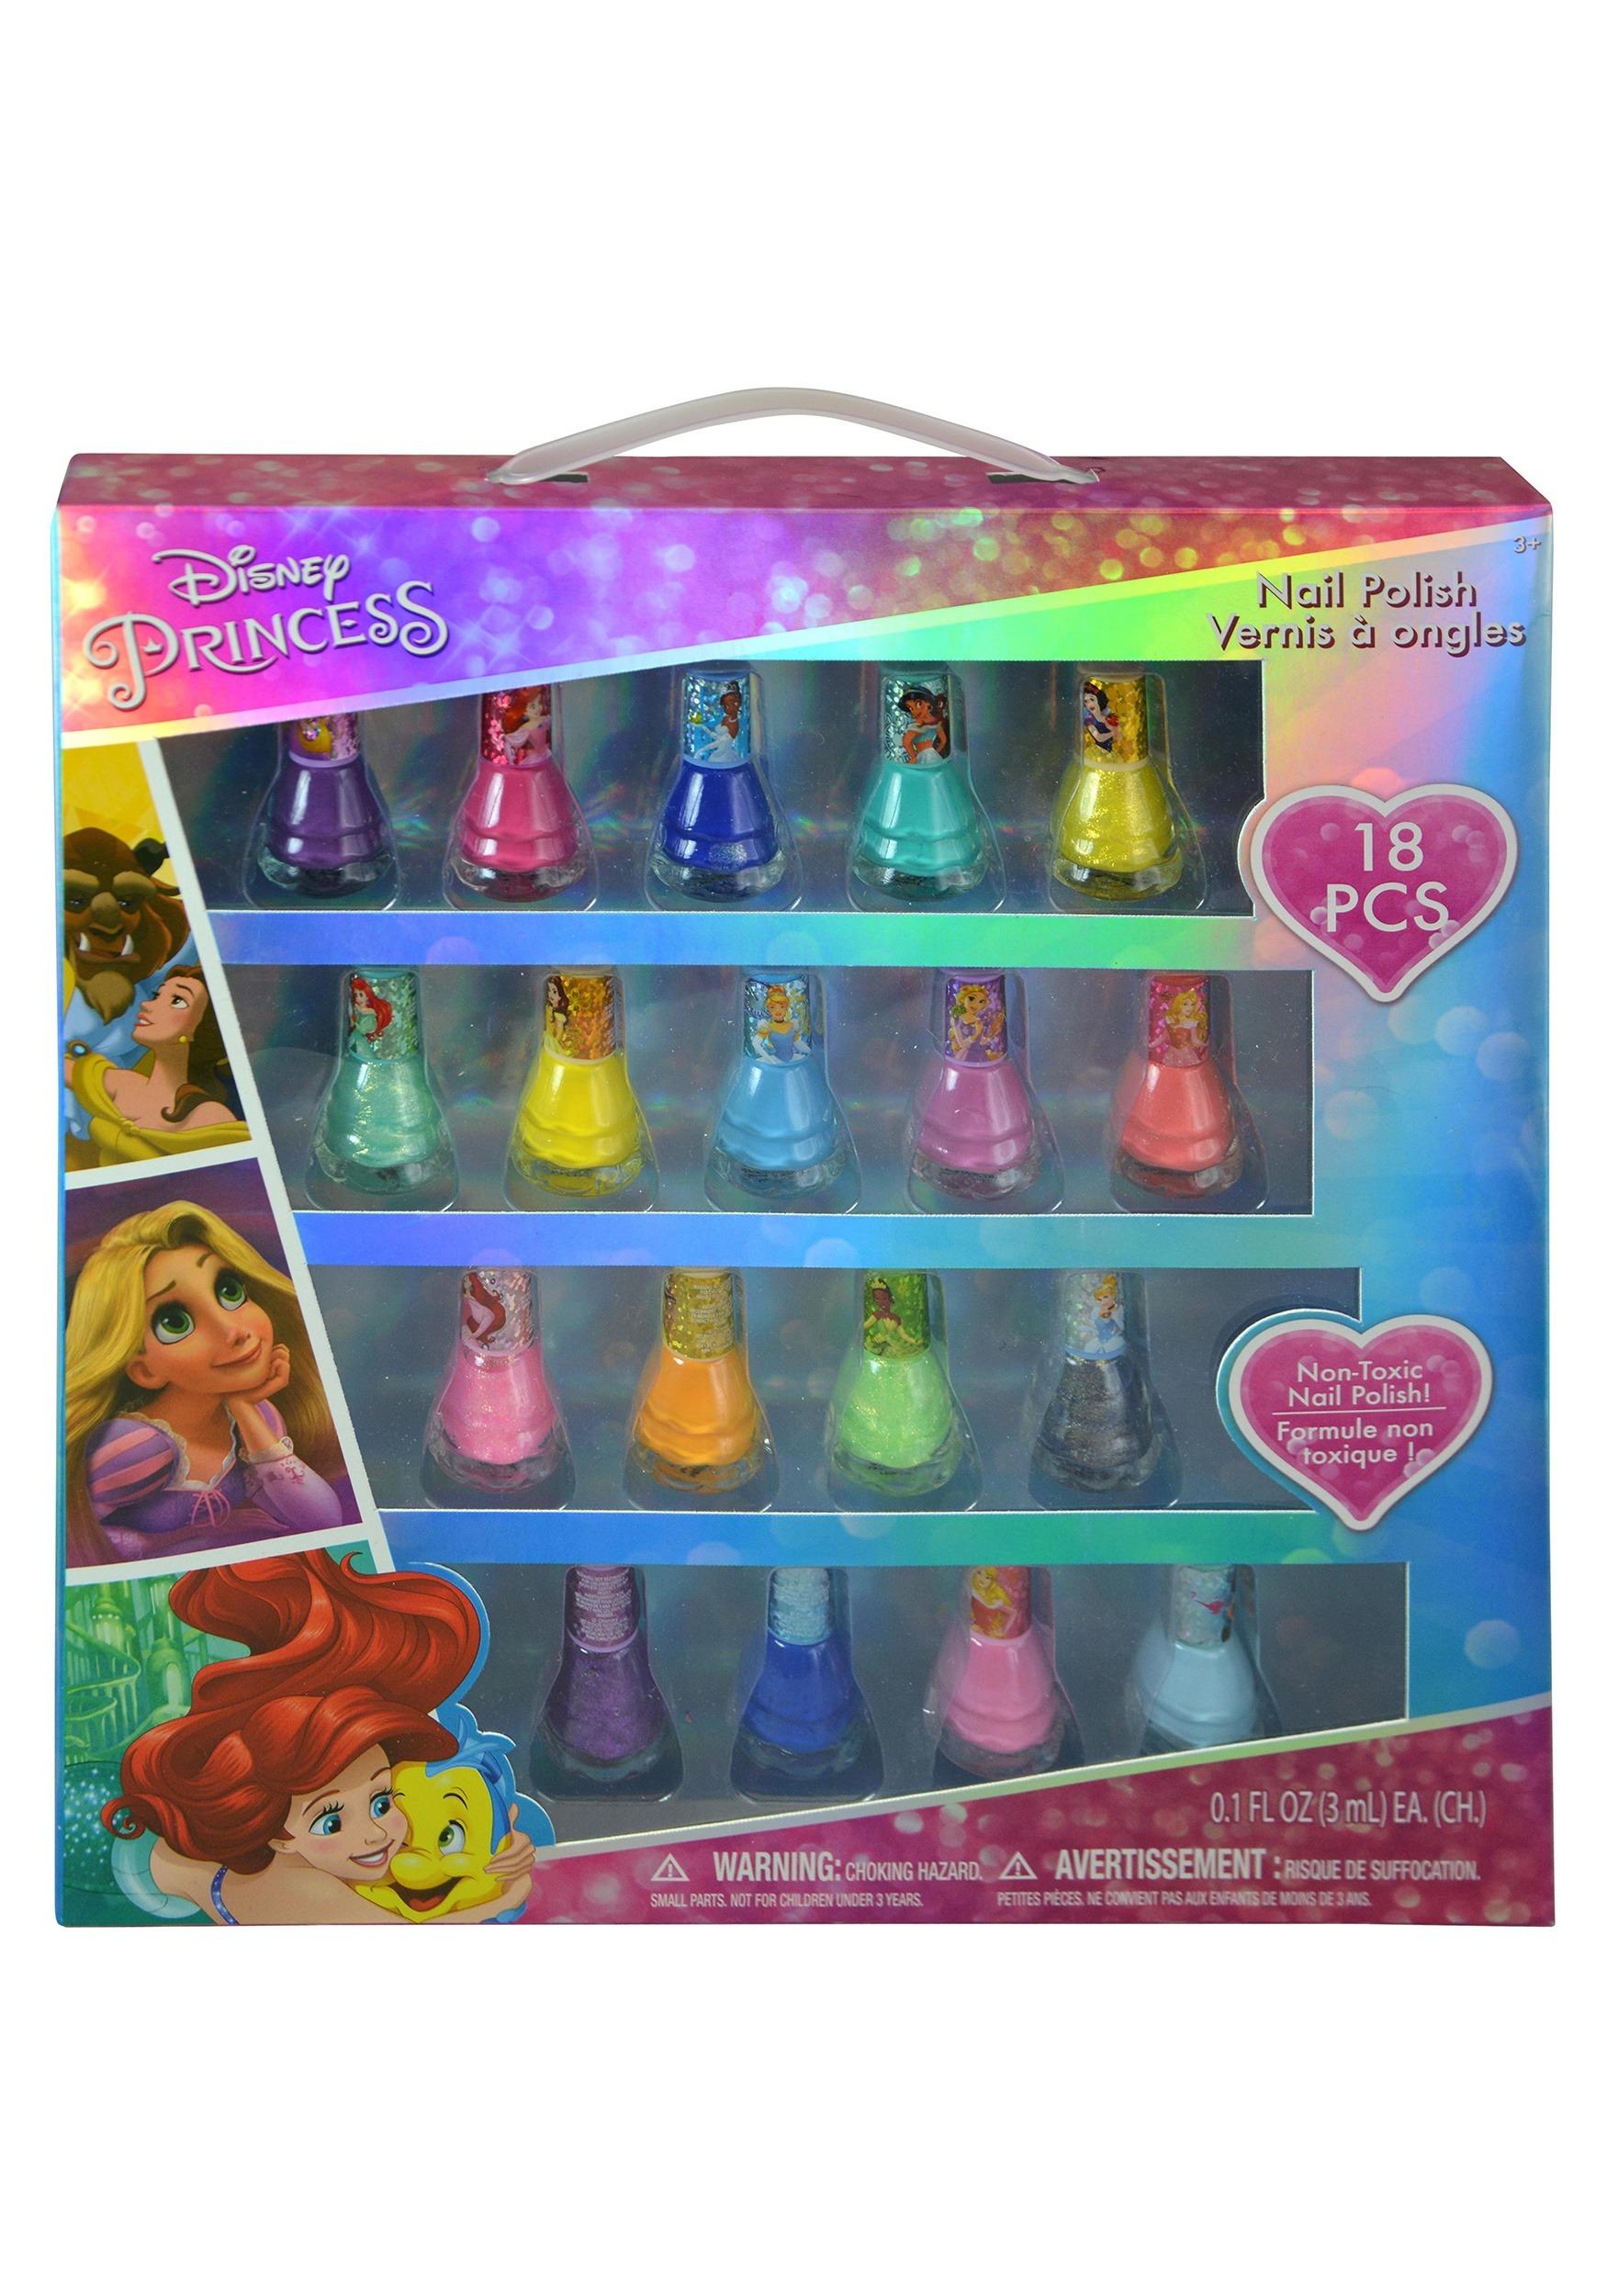 18 Piece Disney Princess Nail Polish Kit